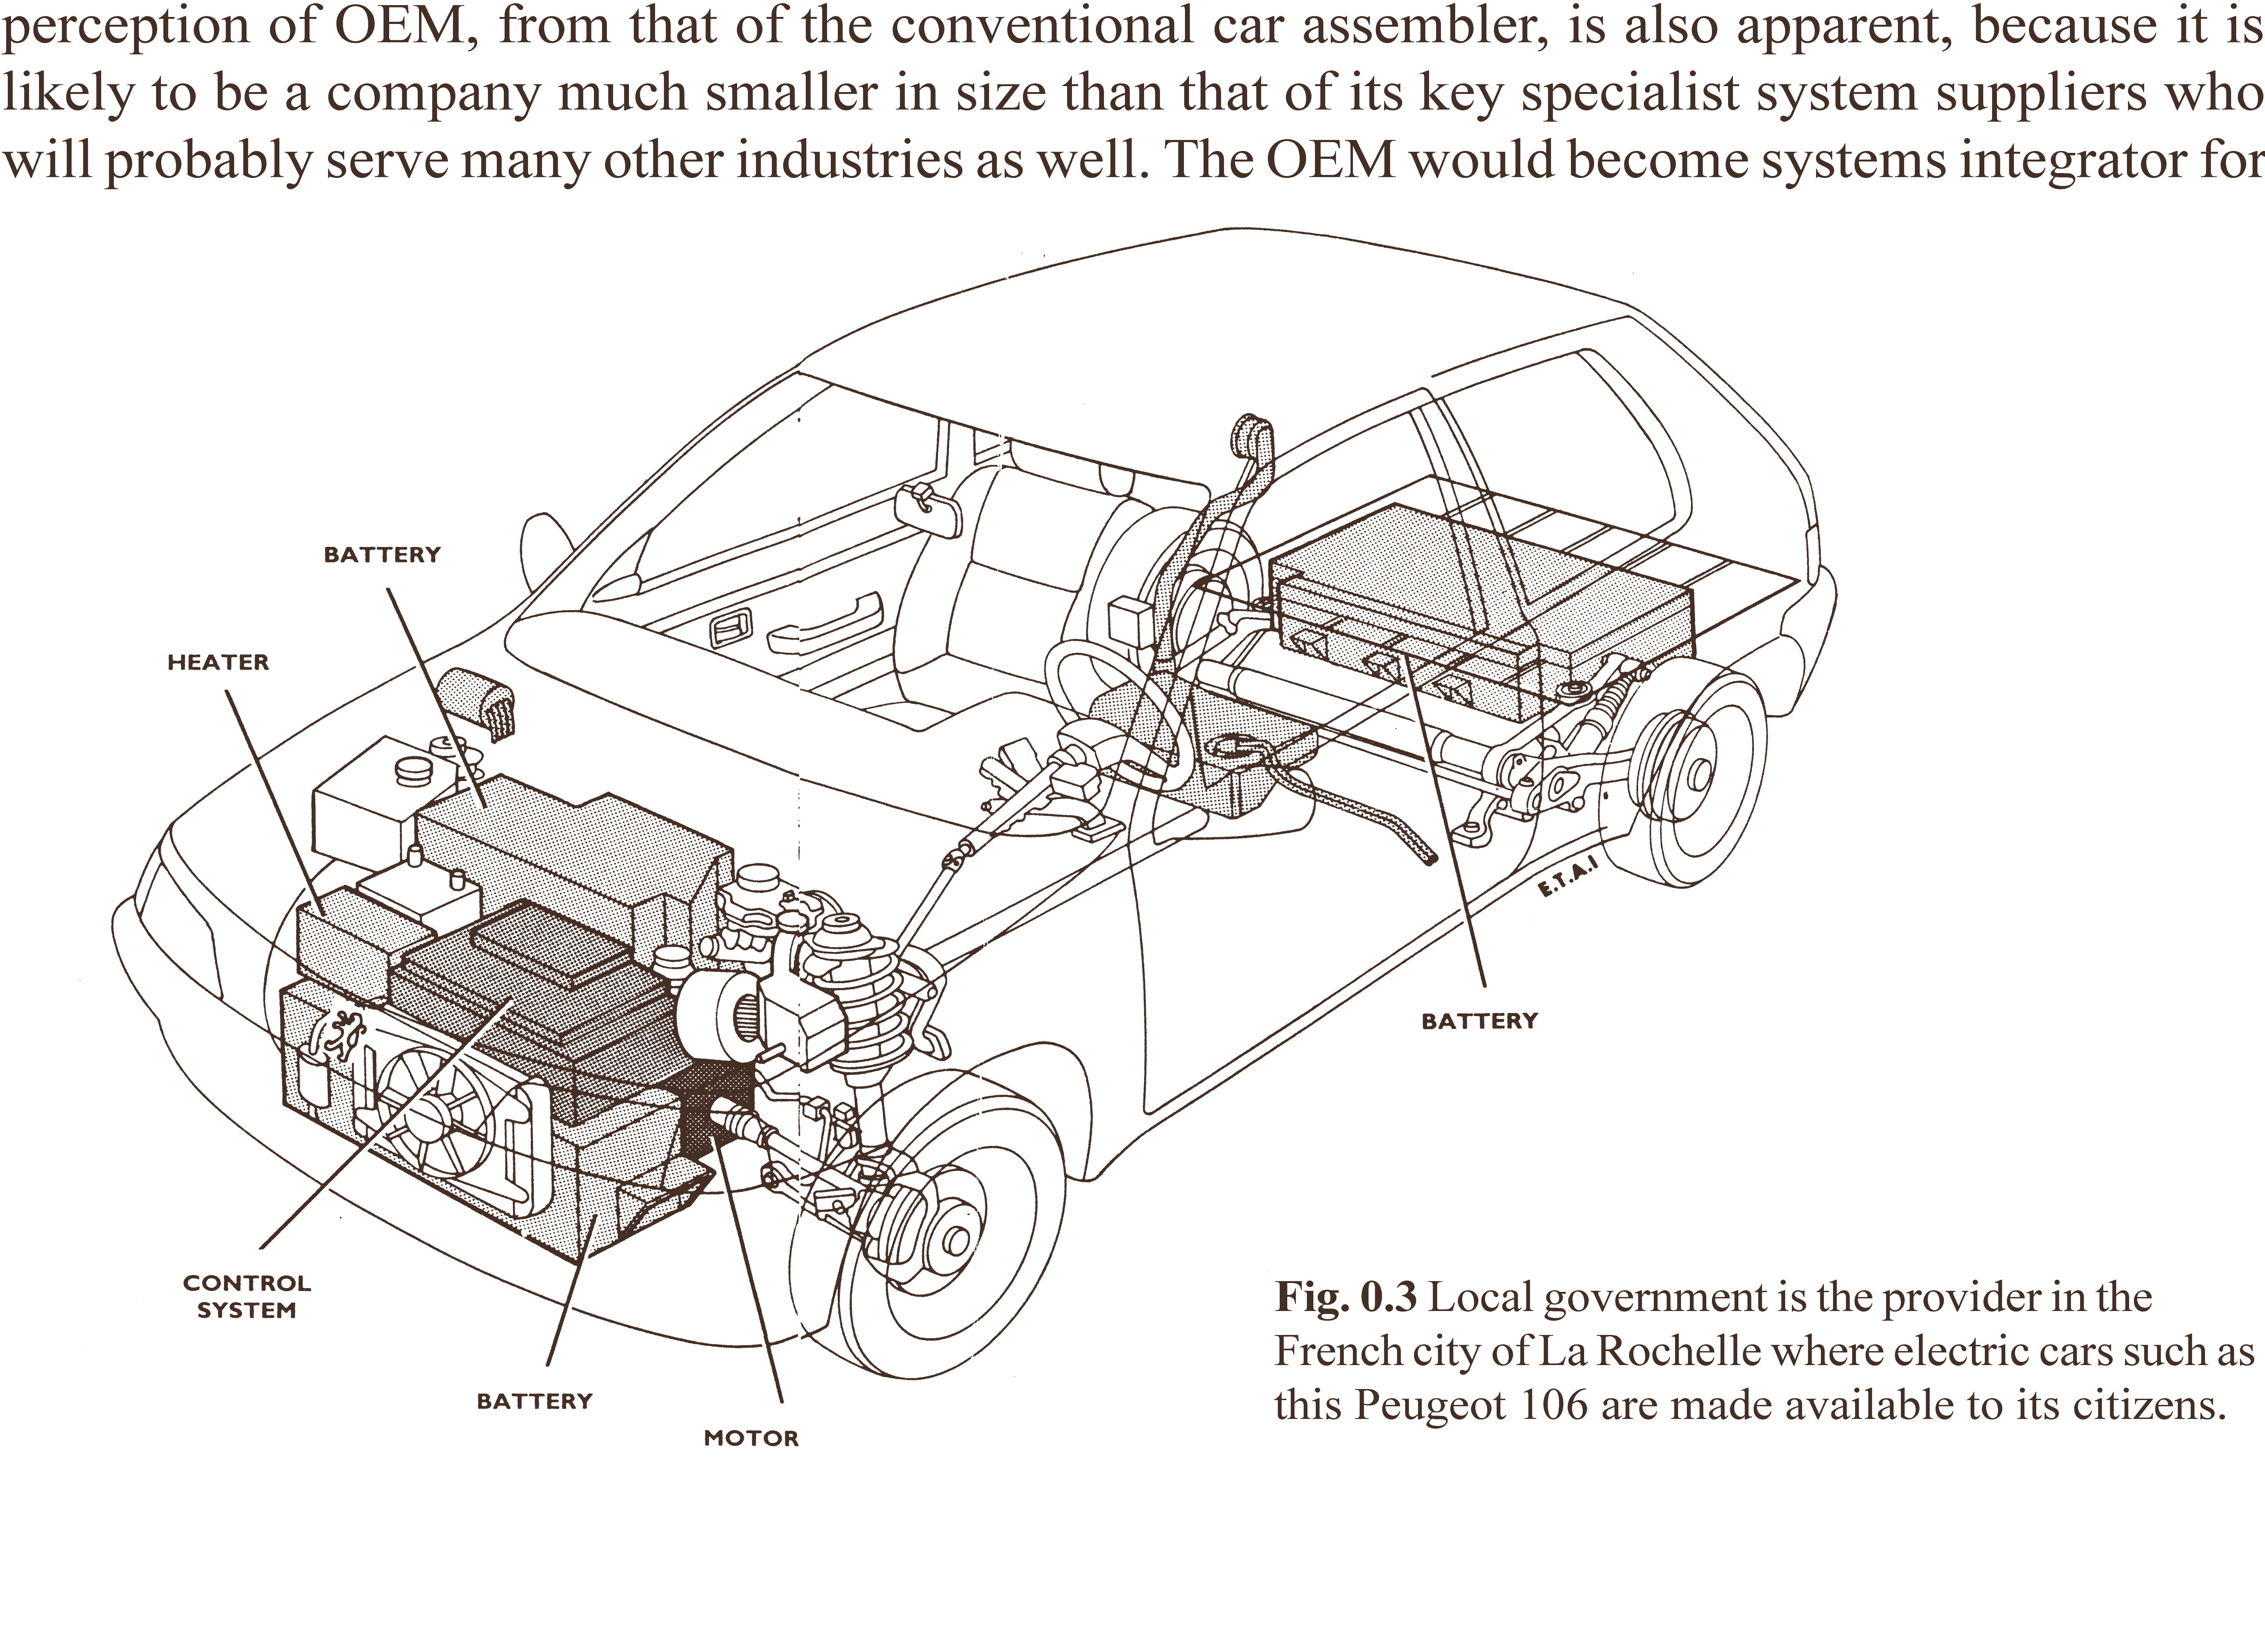 Car Body Diagram Parts Car Electric Vehicle Lightweight Hybrid Ev Design Of Car Body Diagram Parts